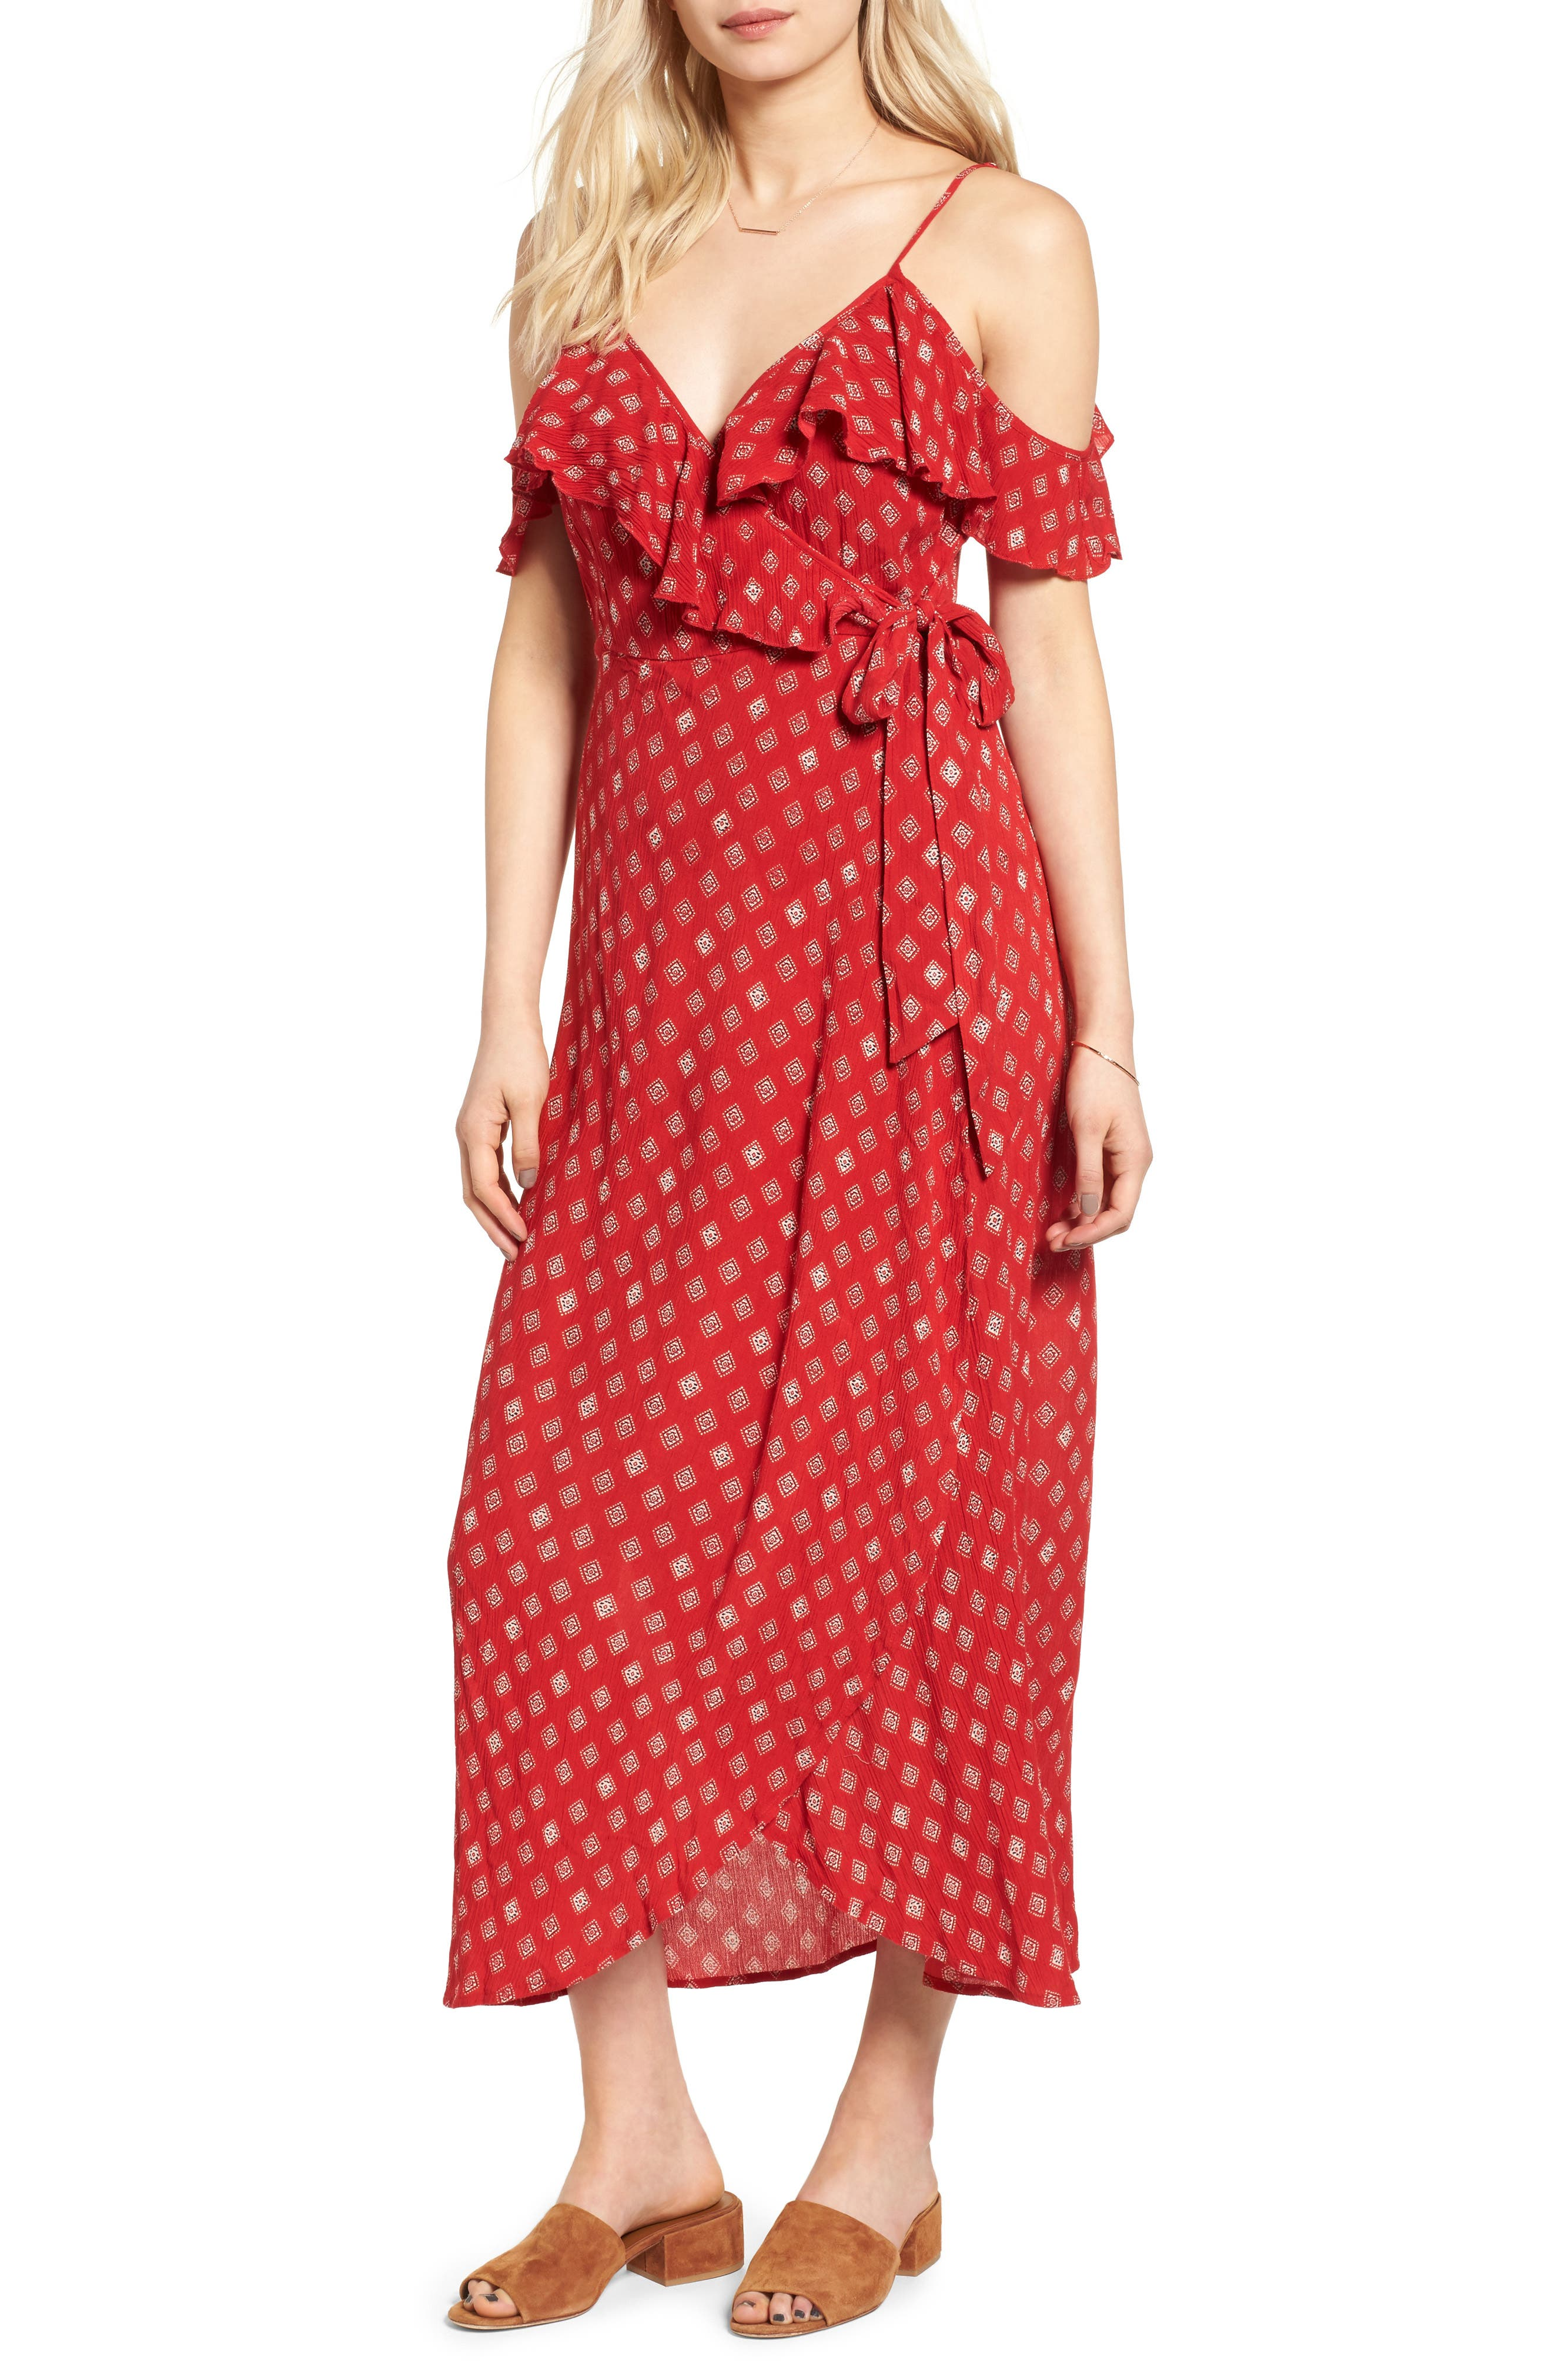 Main Image - Band of Gypsies Foulard Cold Shoulder Dress